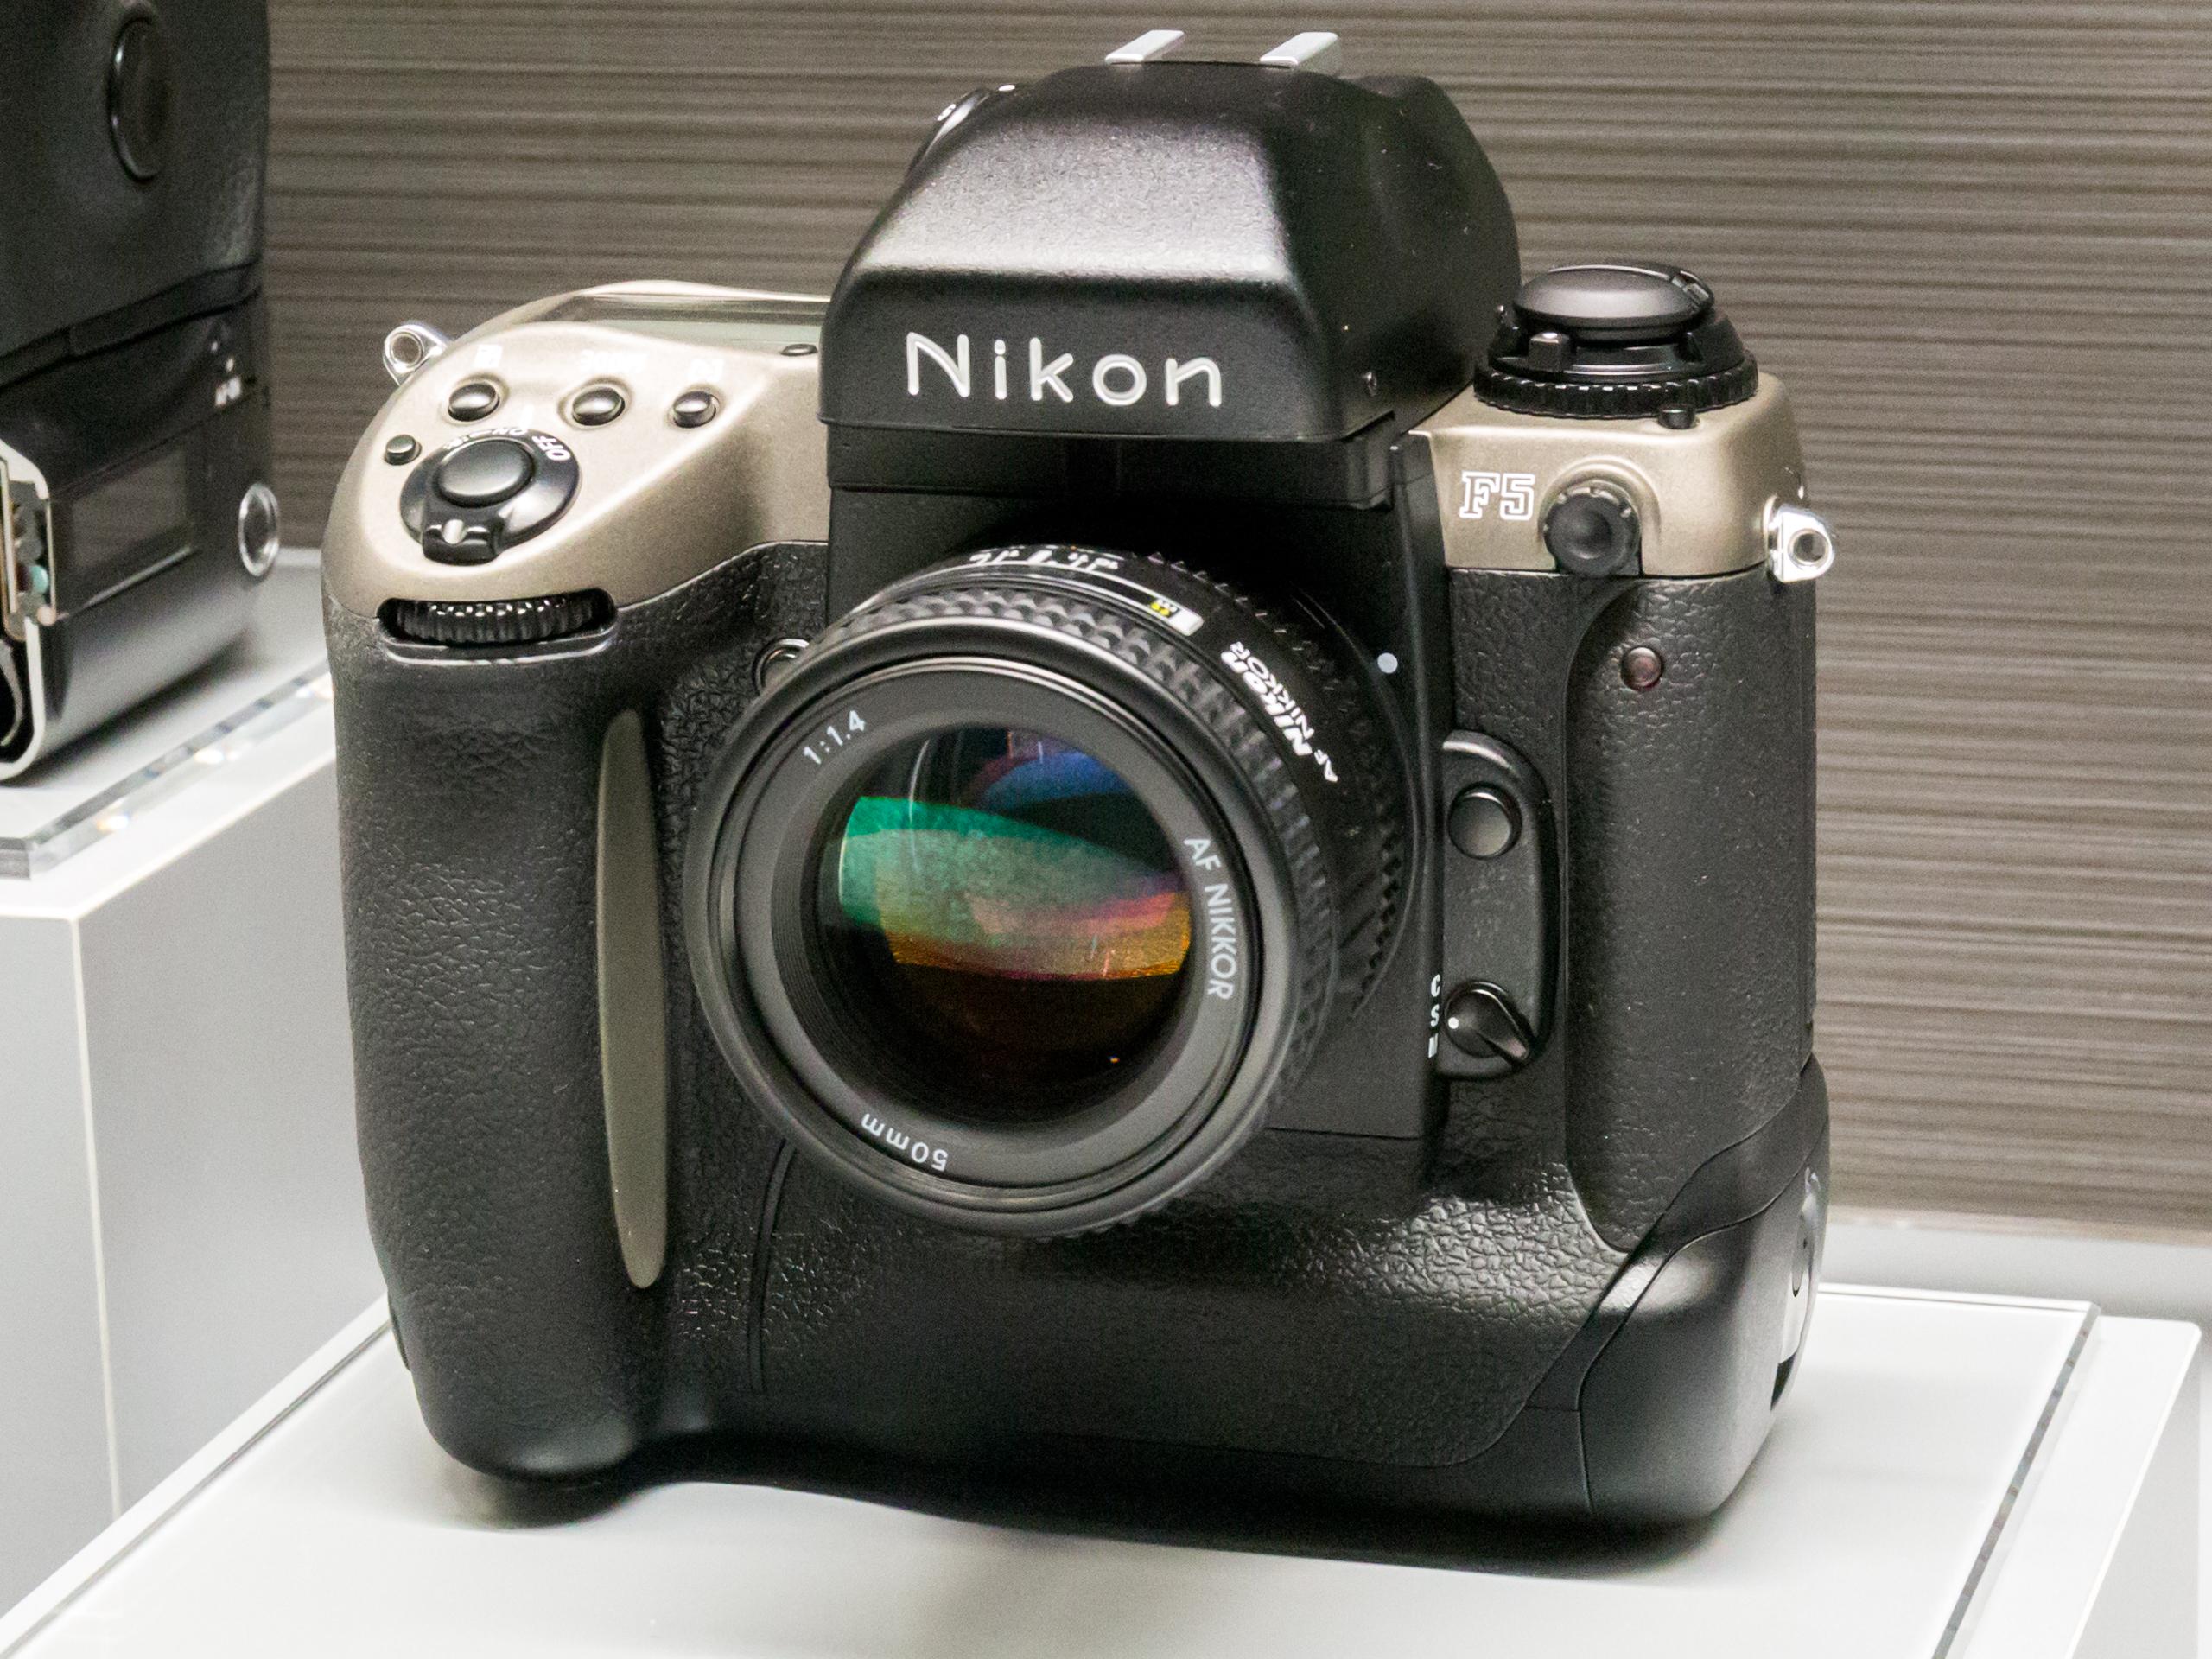 nikon f5 user manual today manual guide trends sample u2022 rh brookejasmine co nikon f5 user manual nikon f5 instruction manual